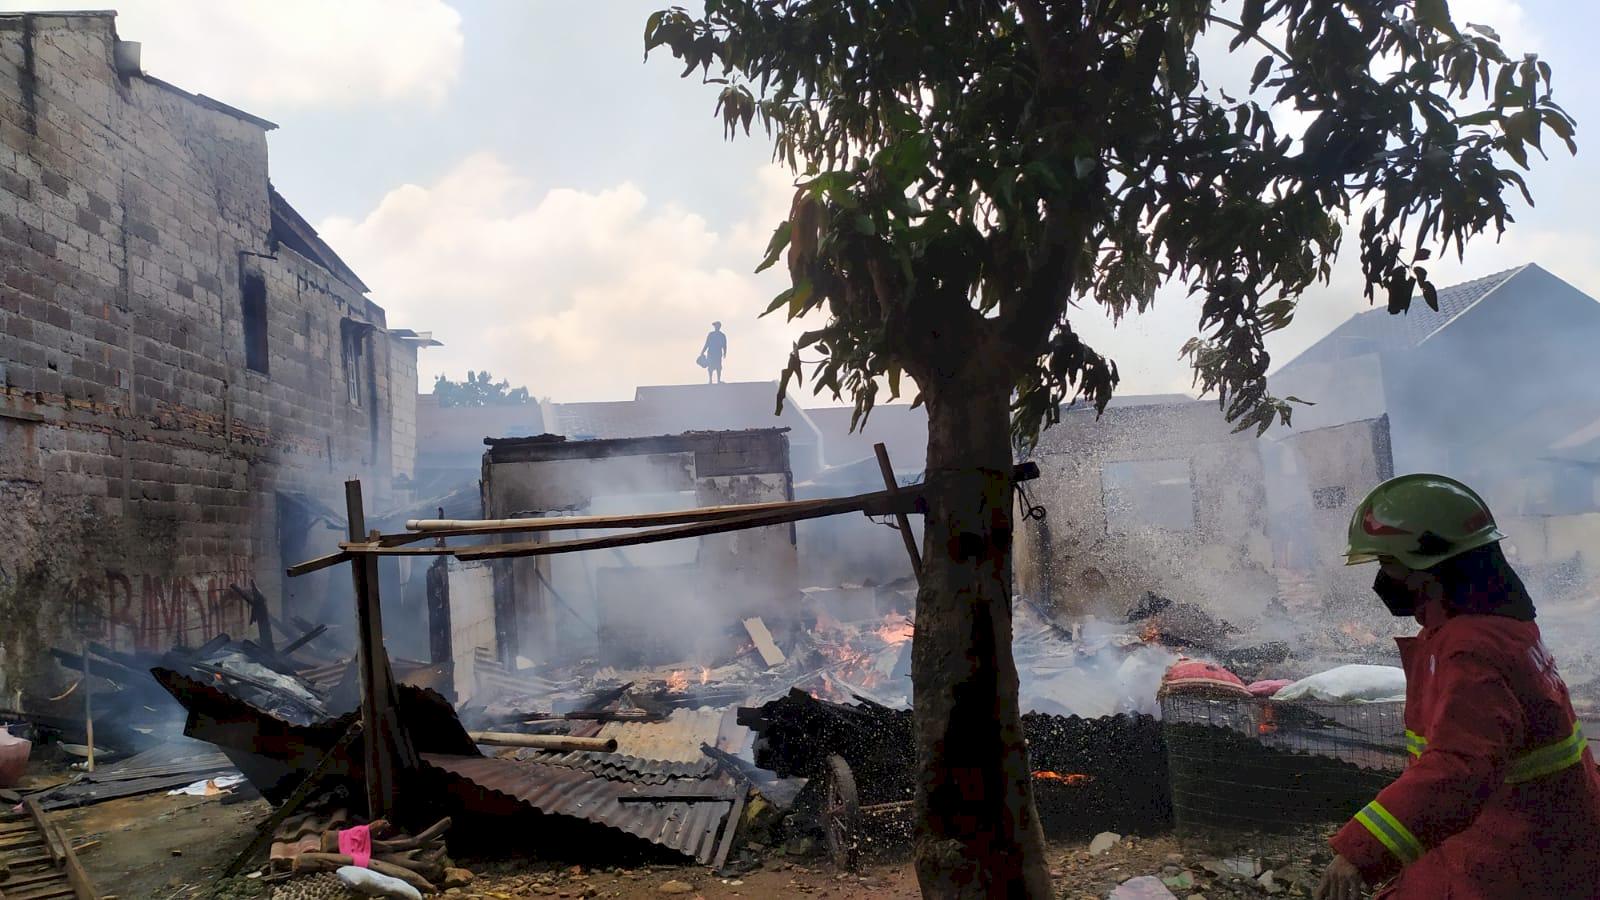 Rumah di Pamulang Ludes Terbakar, Sempat Terdengar Suara Ledakan